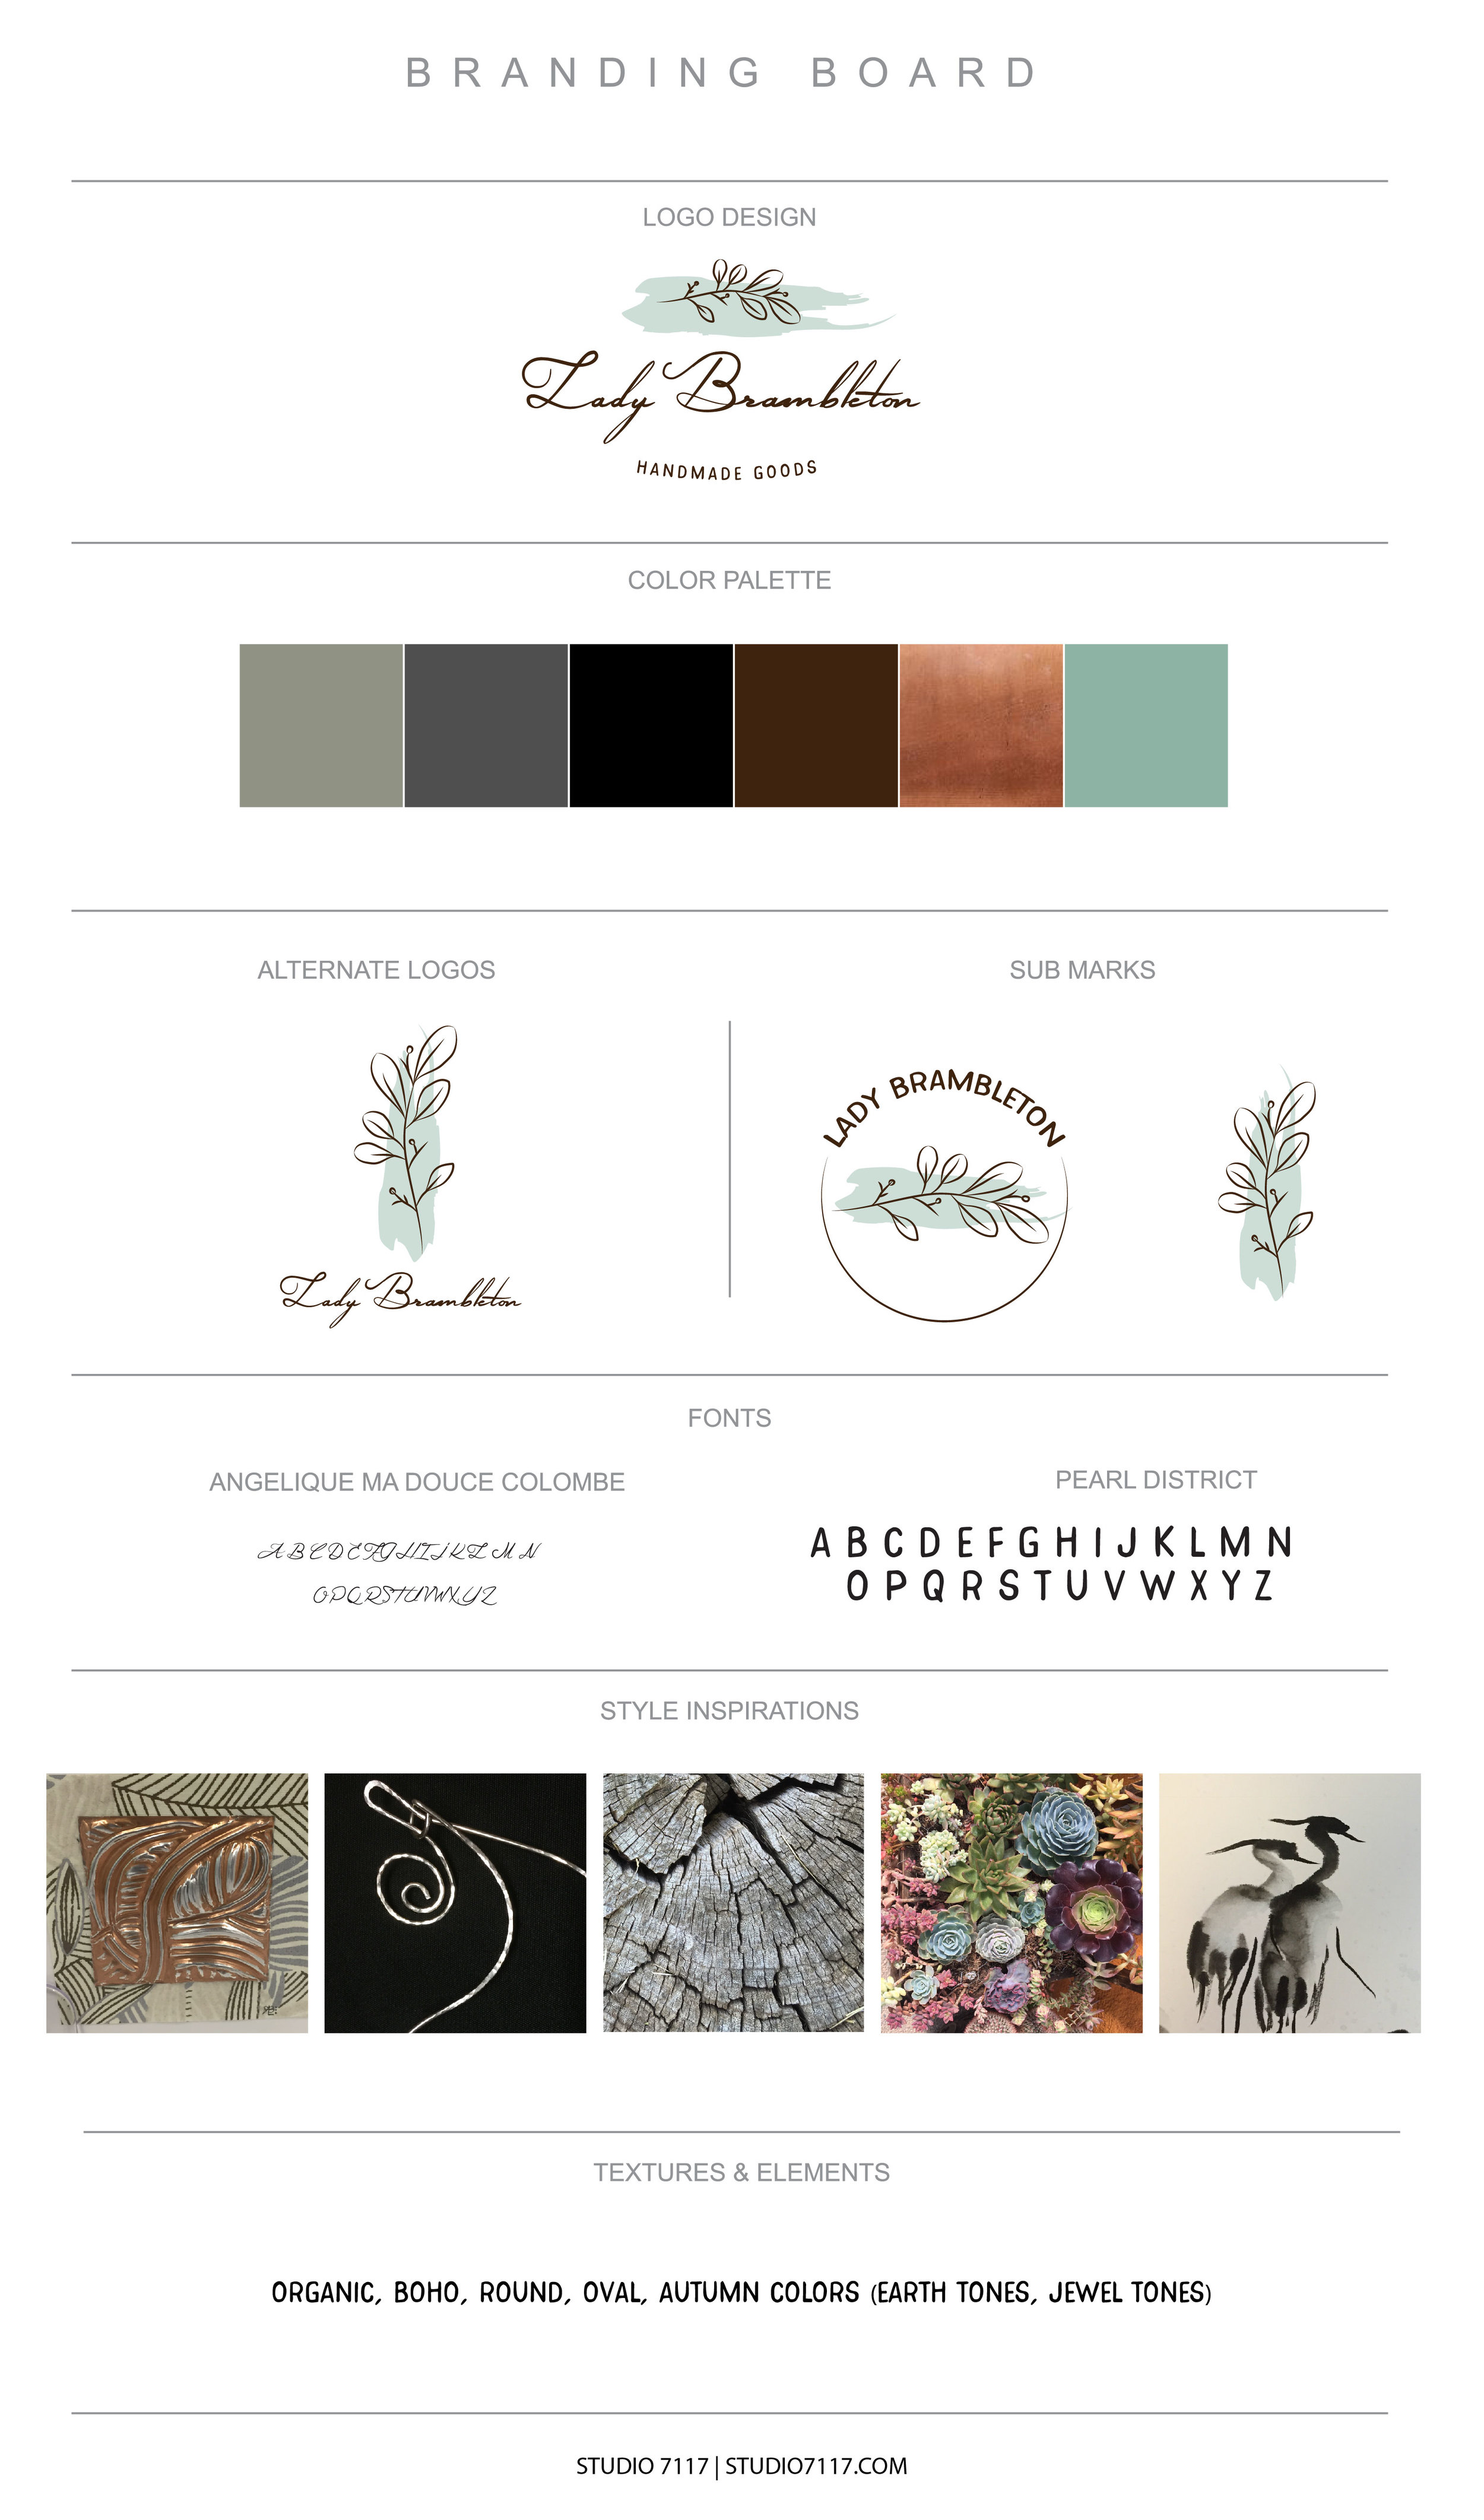 Lady Brambleton Brand Board-01.jpg